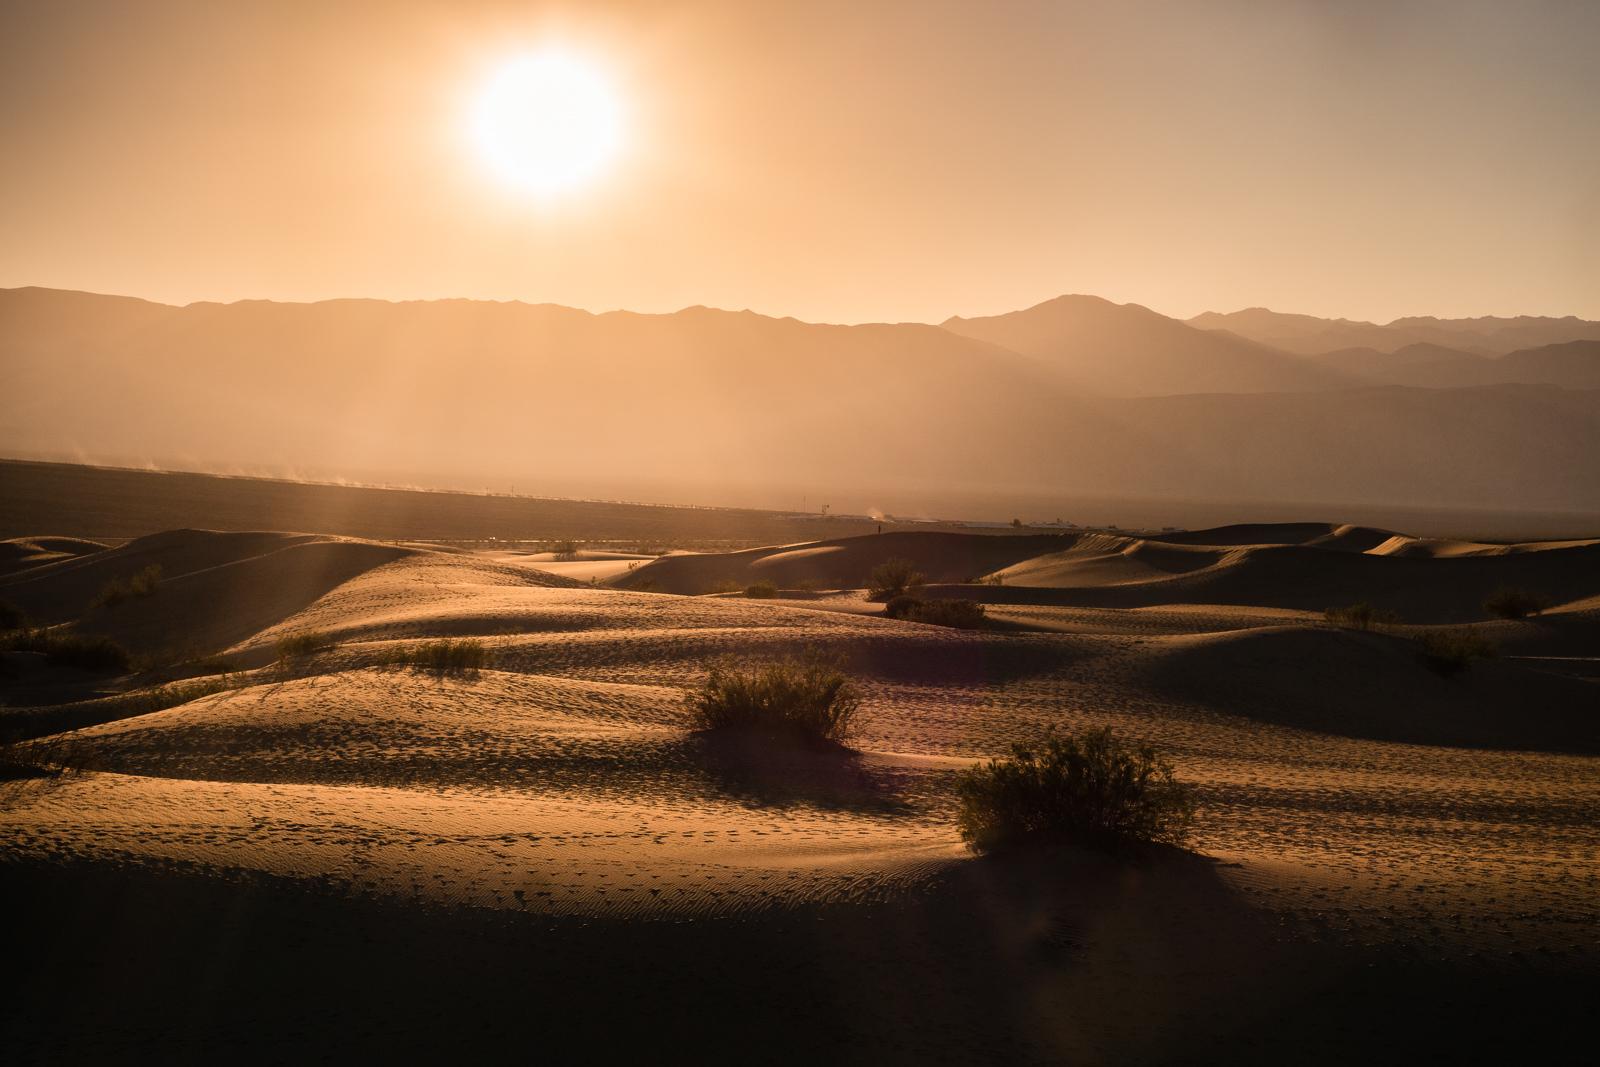 3_Death-Valley-dunes-landscape_Joseph-Barber-Studios.jpg